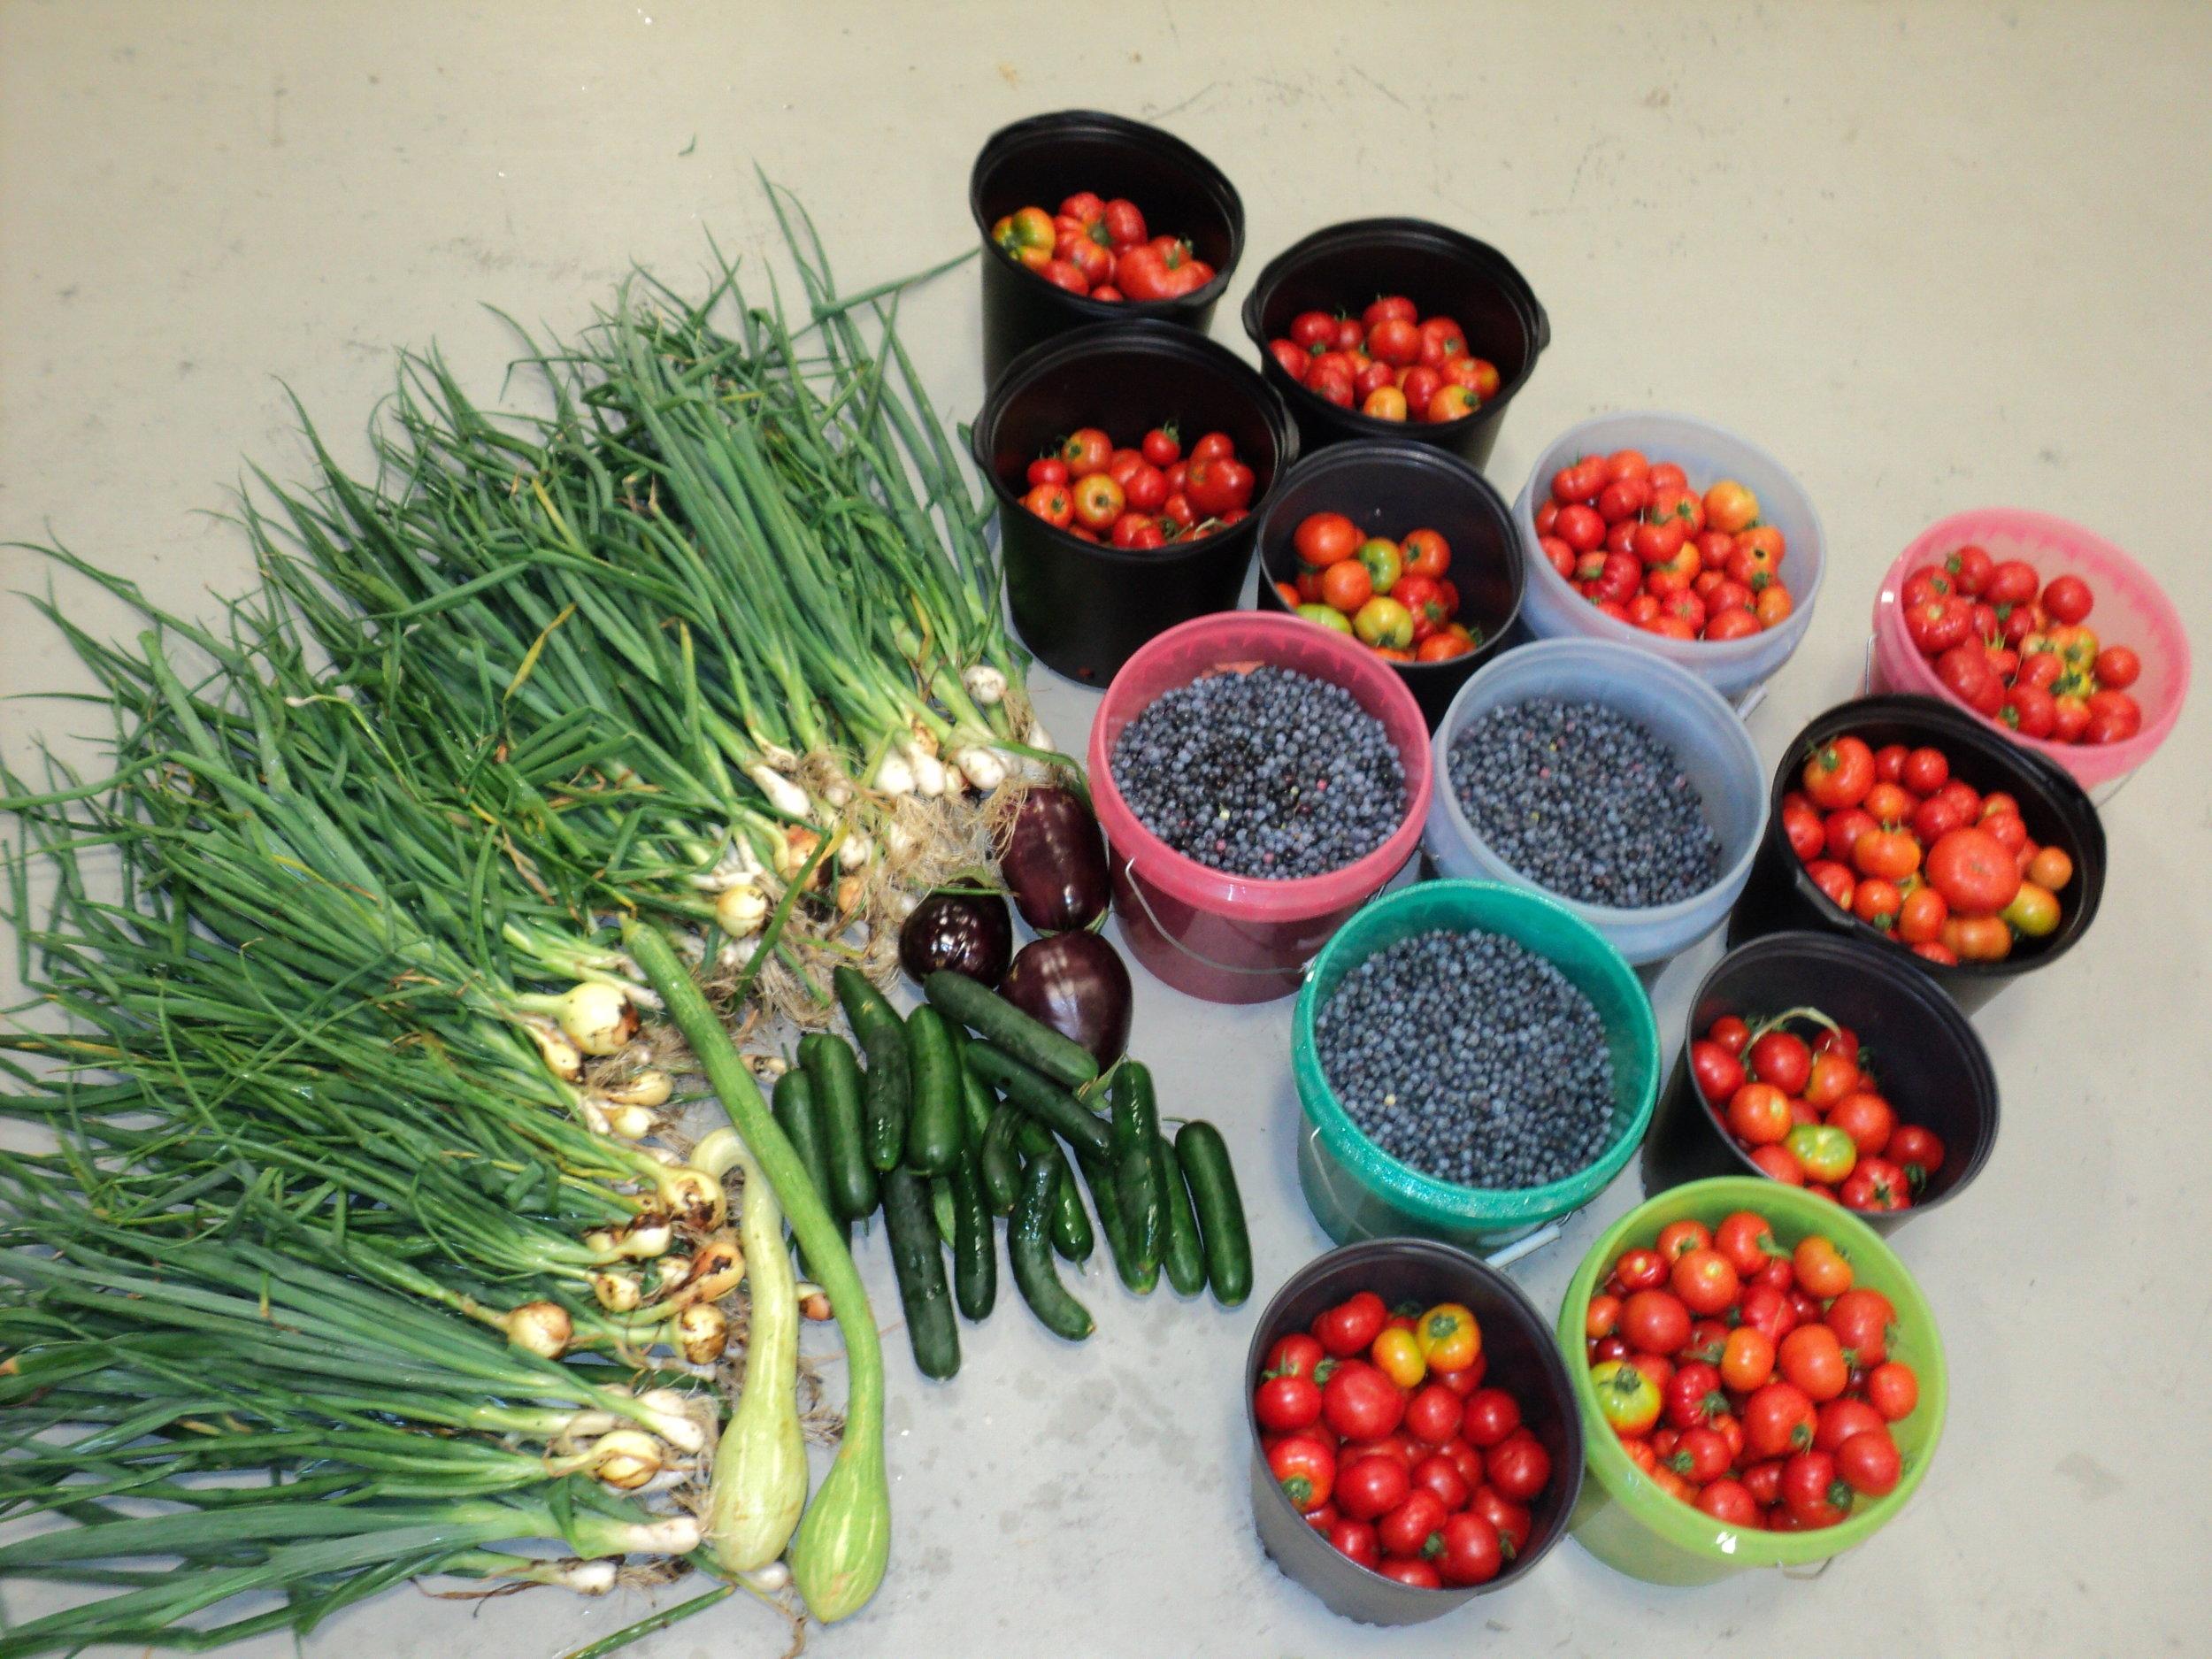 MFF Harvest 7-15-12.JPG